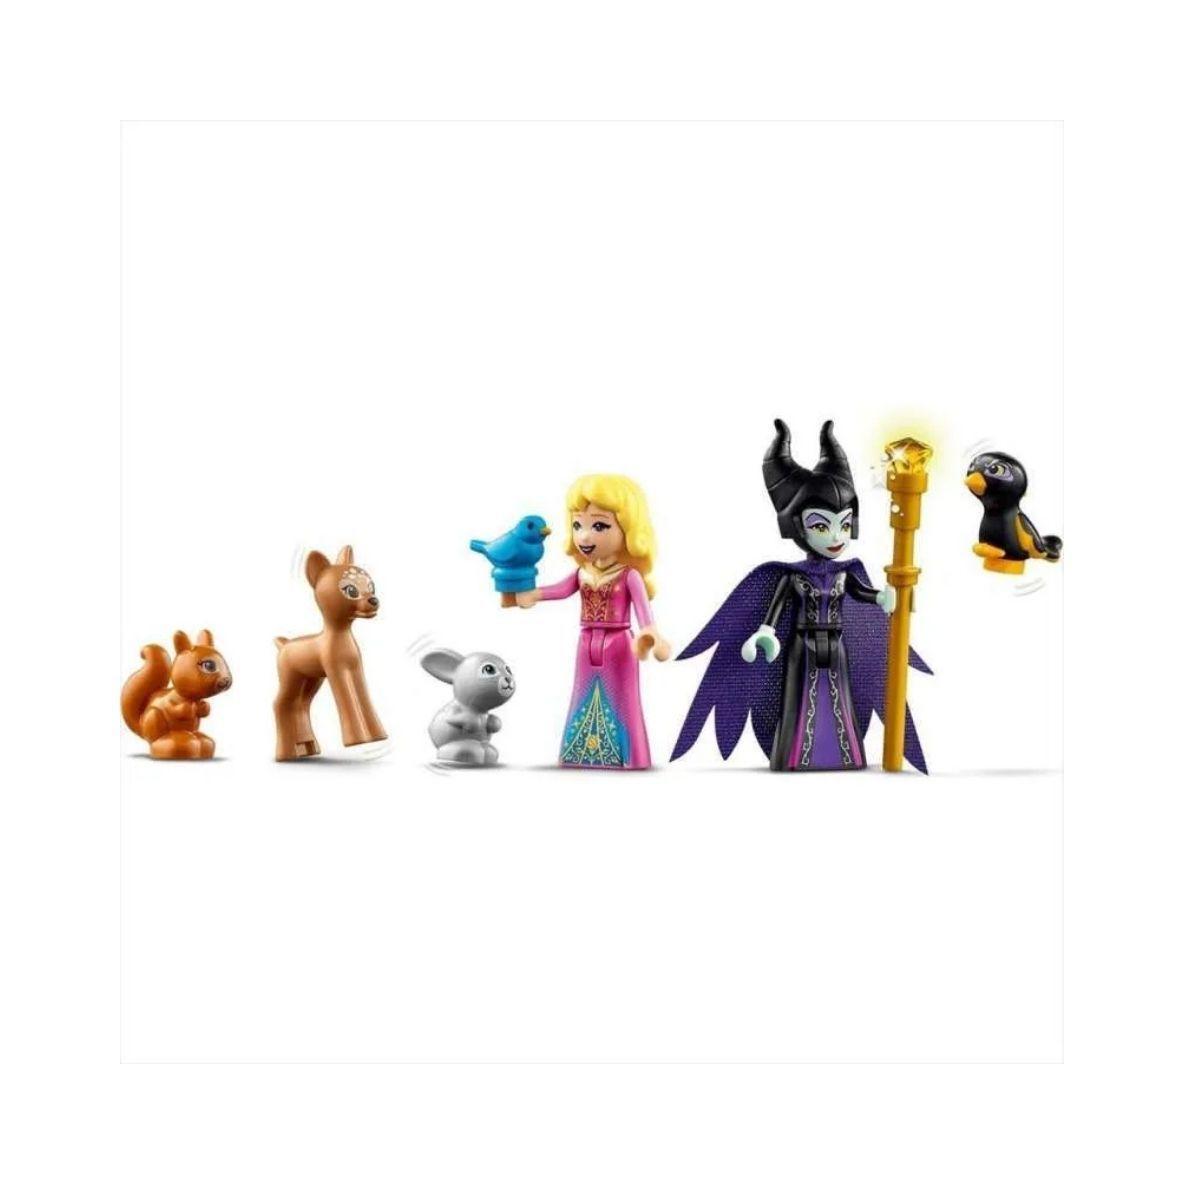 Lego Disney Casa da Floresta de Aurora - Lego 43188